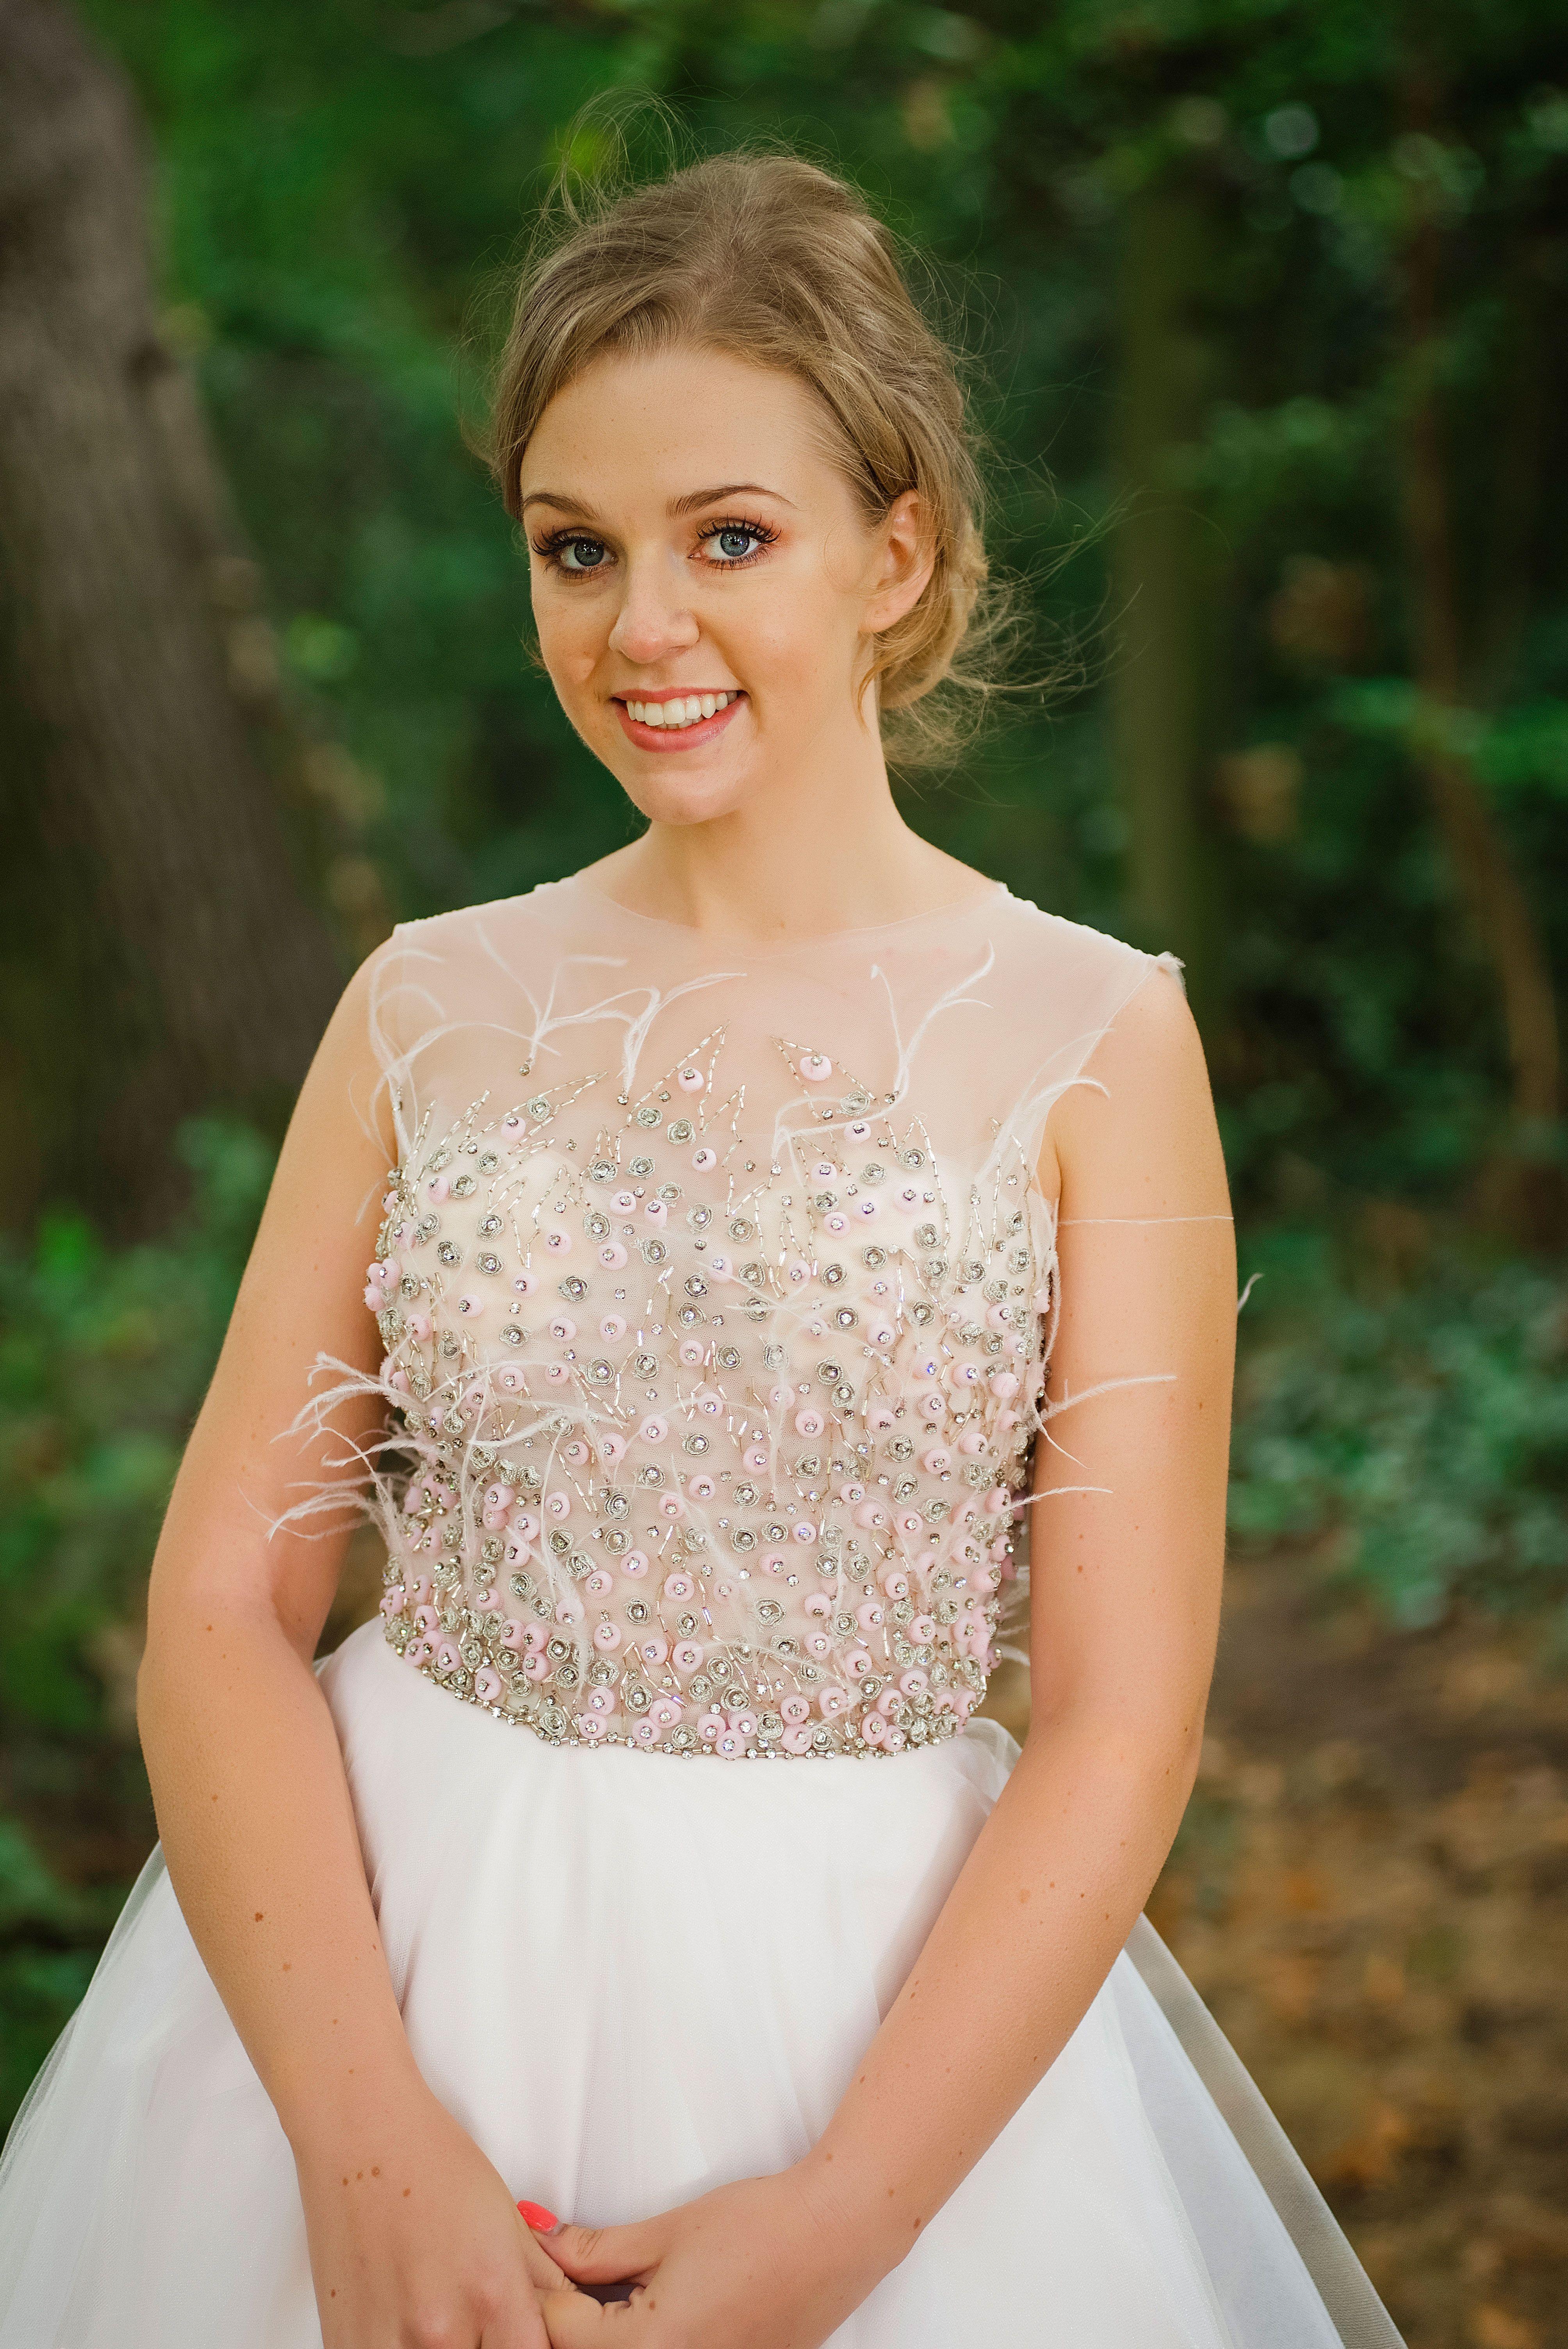 Handmade wedding dress  Morgan  romantic and feminine crystal feathers and organza pale